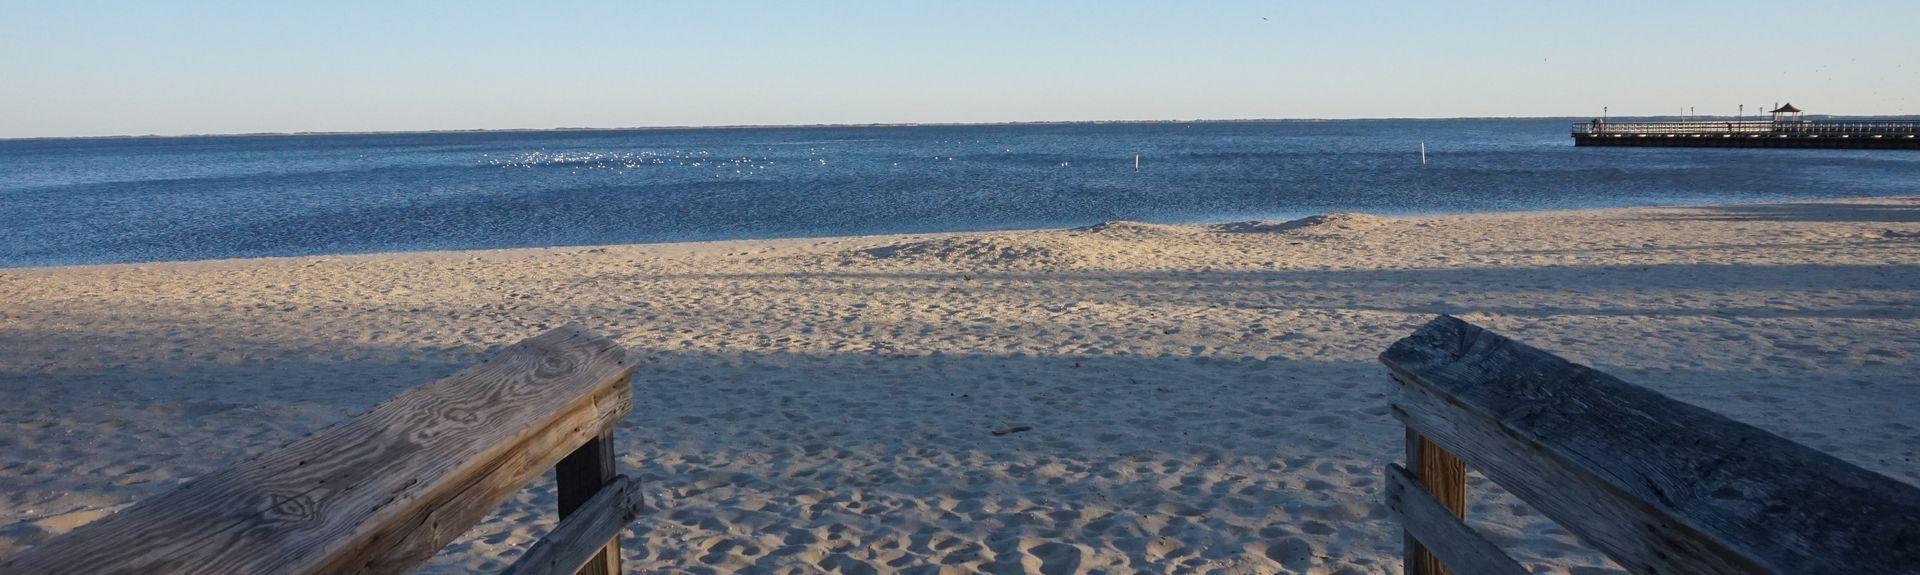 Lighthouse Beach, Bay Shore, New York, USA